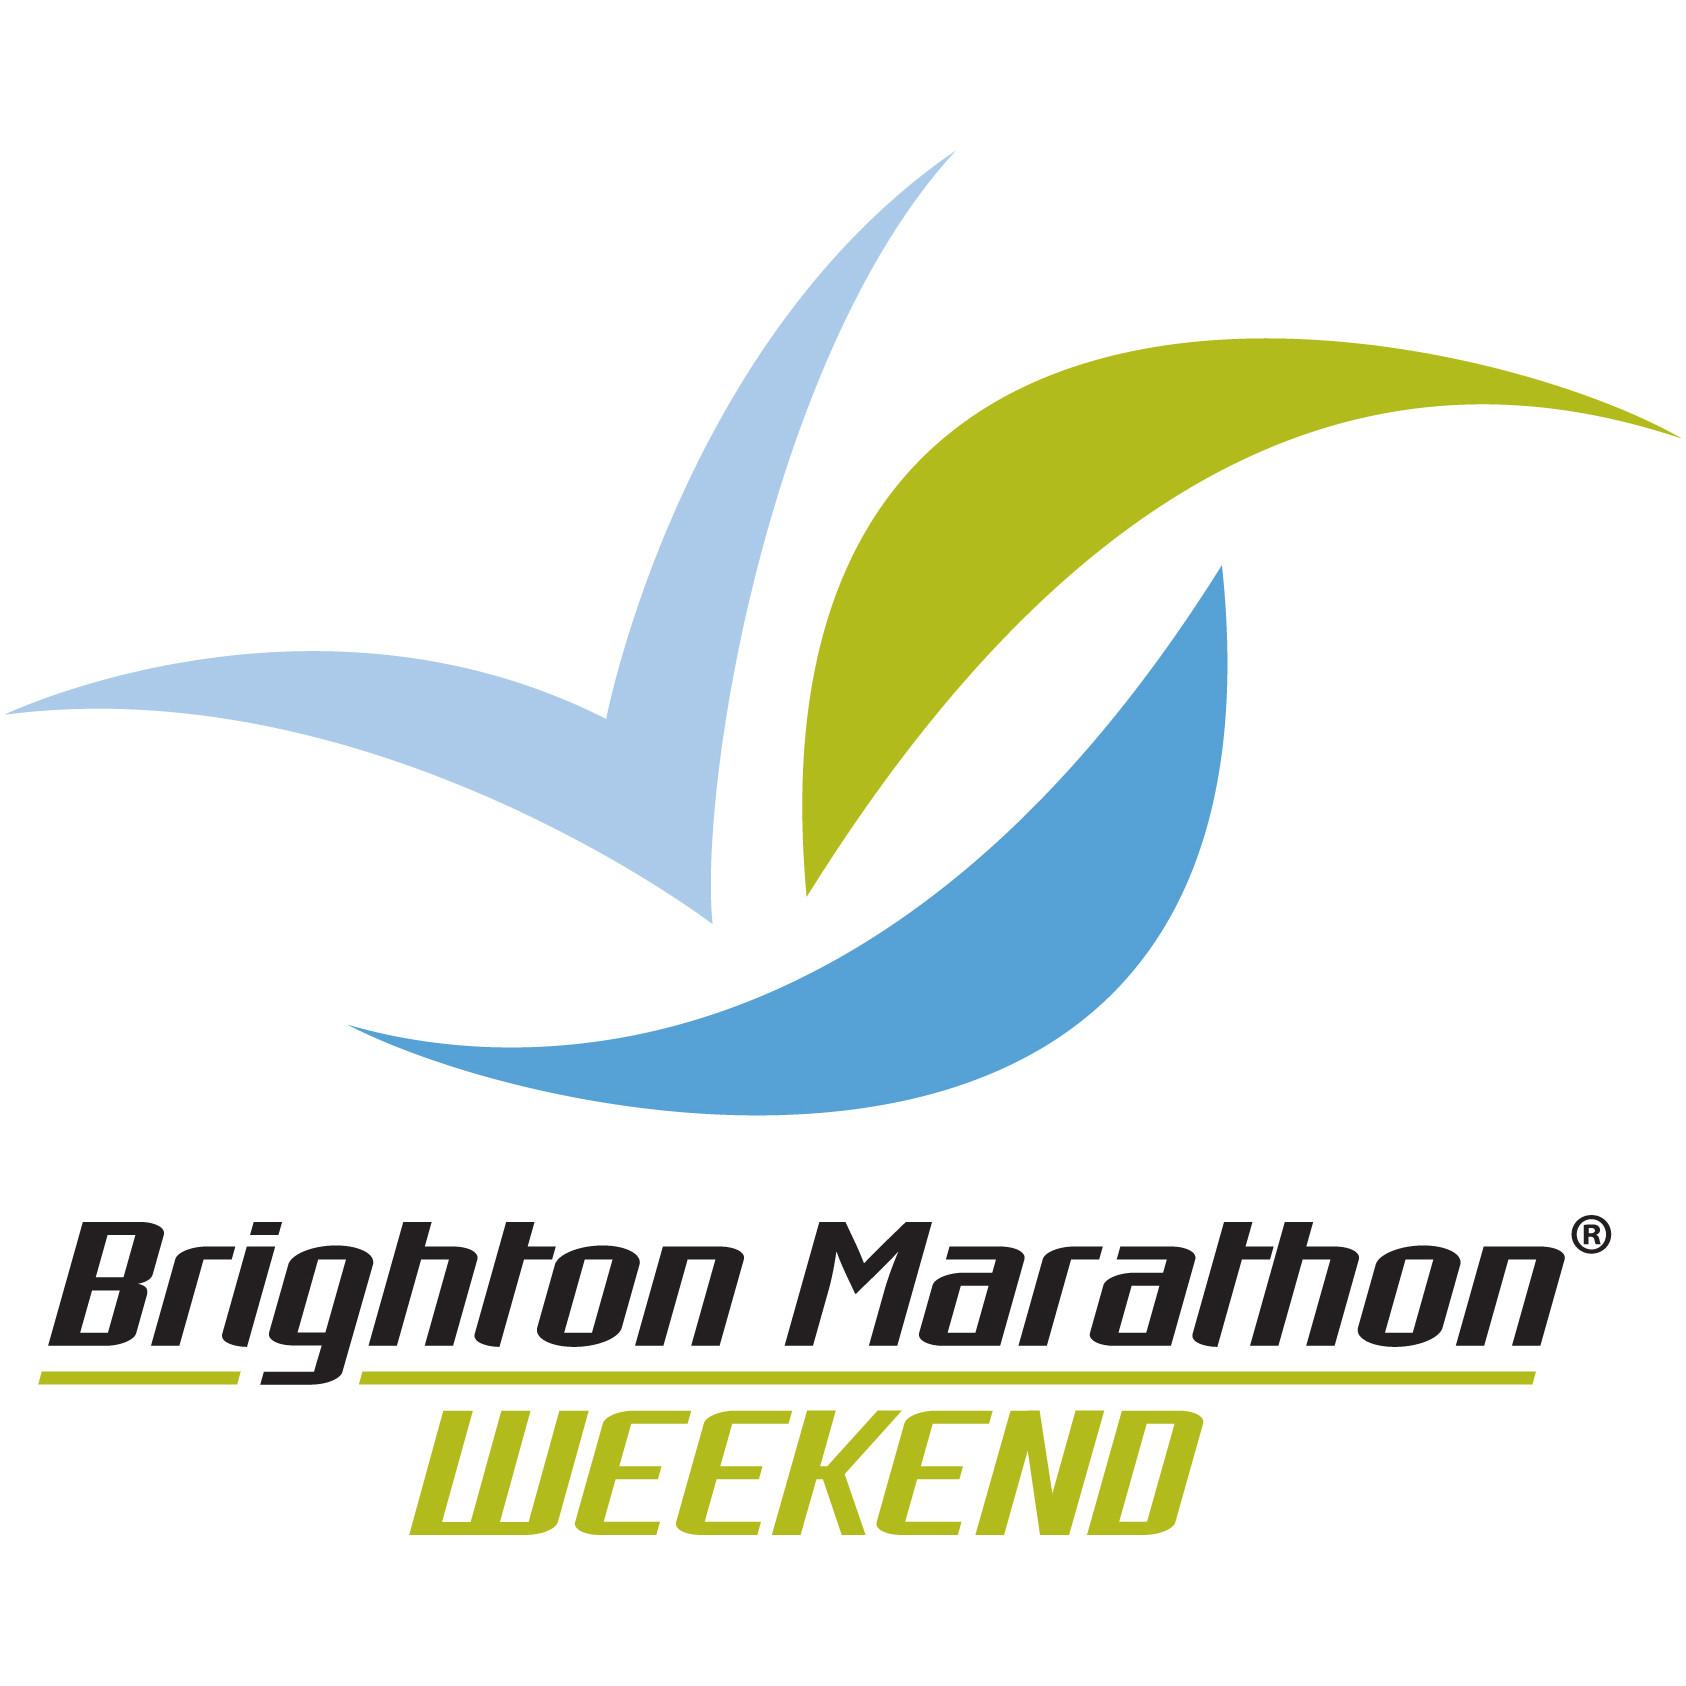 Brighton Marathon 19th – 20th September 2020